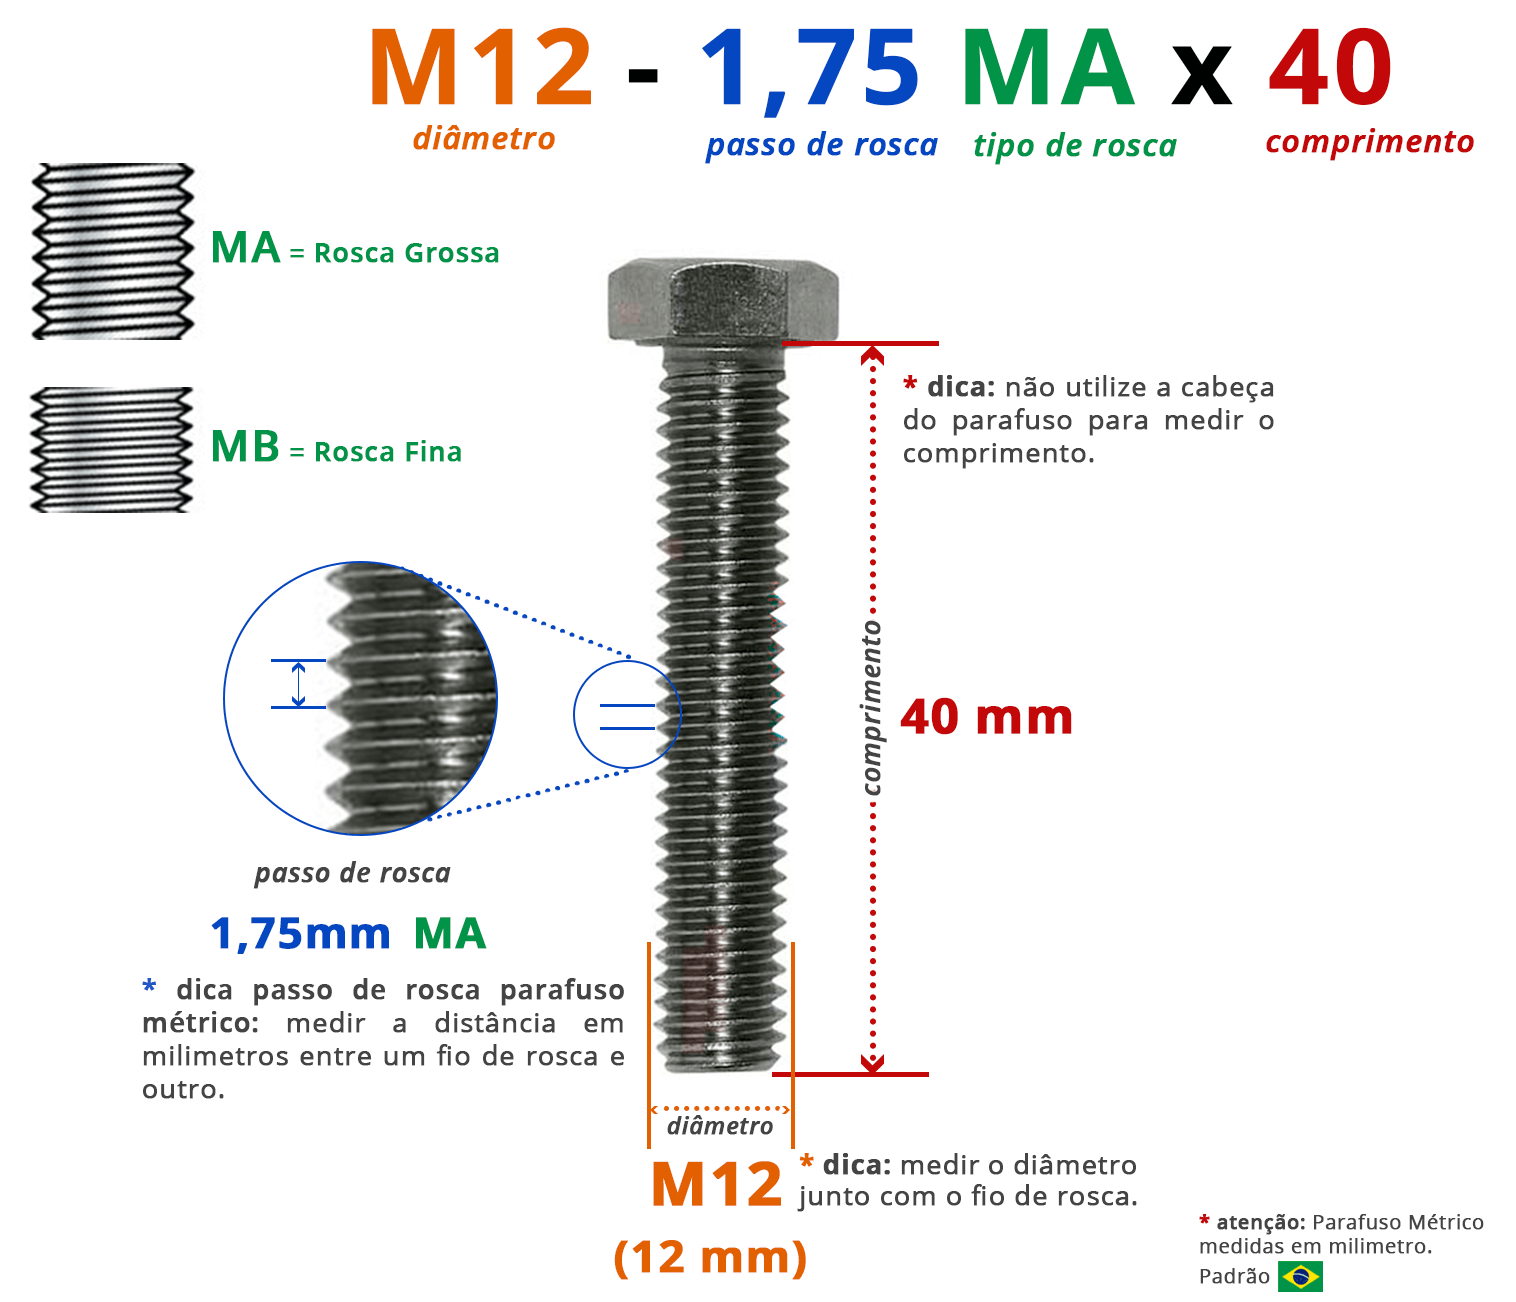 PARAFUSO SEXTAVADO ROSCA INTEIRA M12 1,75 MA X 40 DIN 933 INOX A4